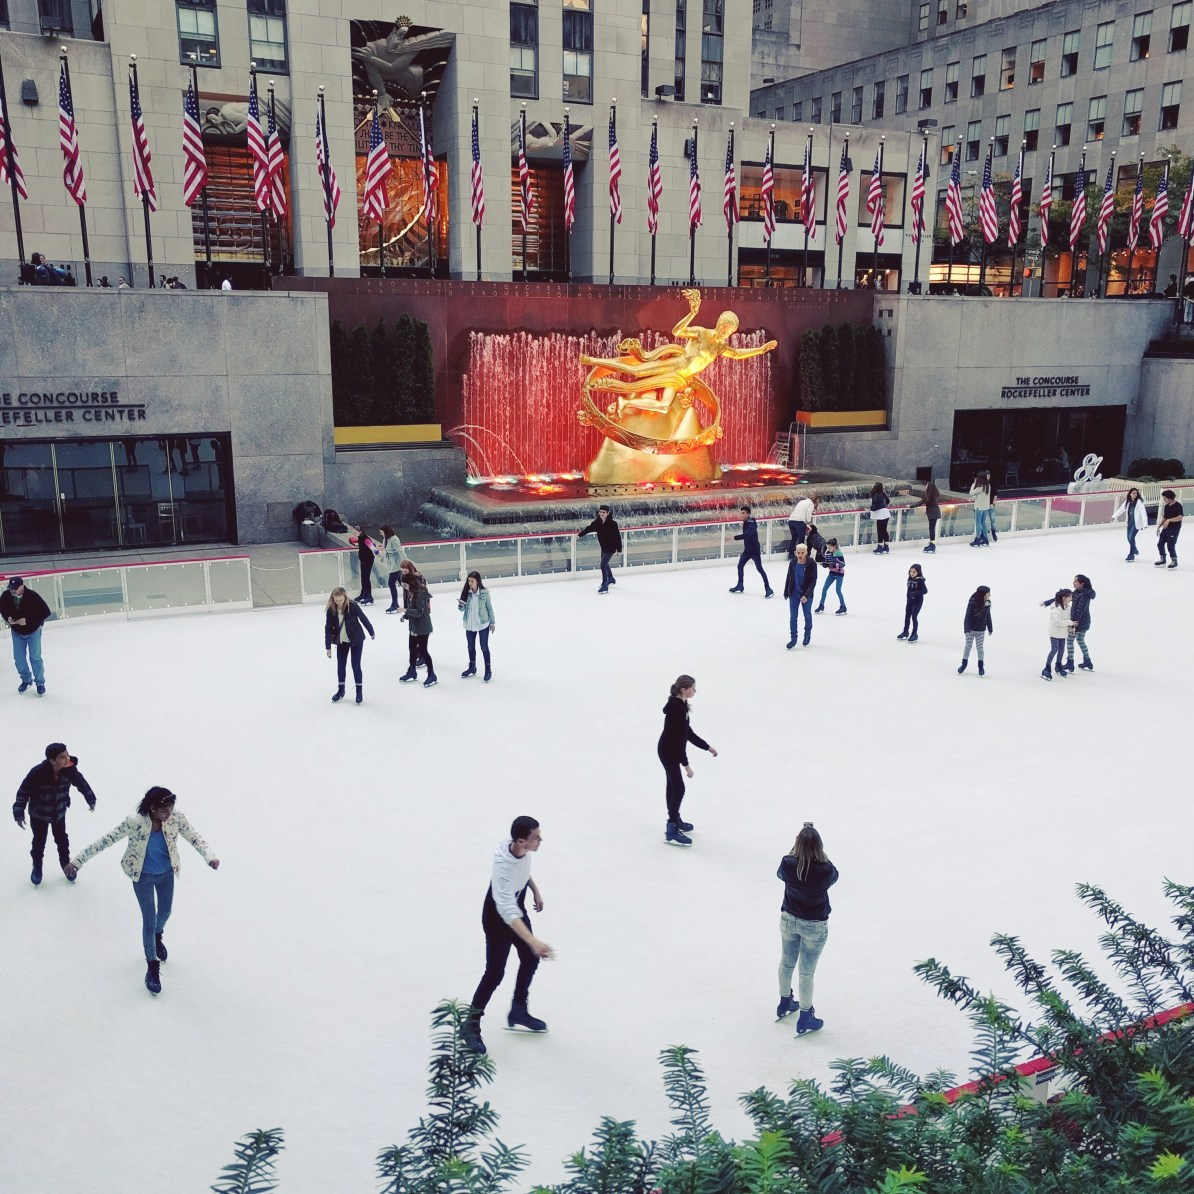 Rockerfeller Plaza Ice Rink, Christmas in New York City